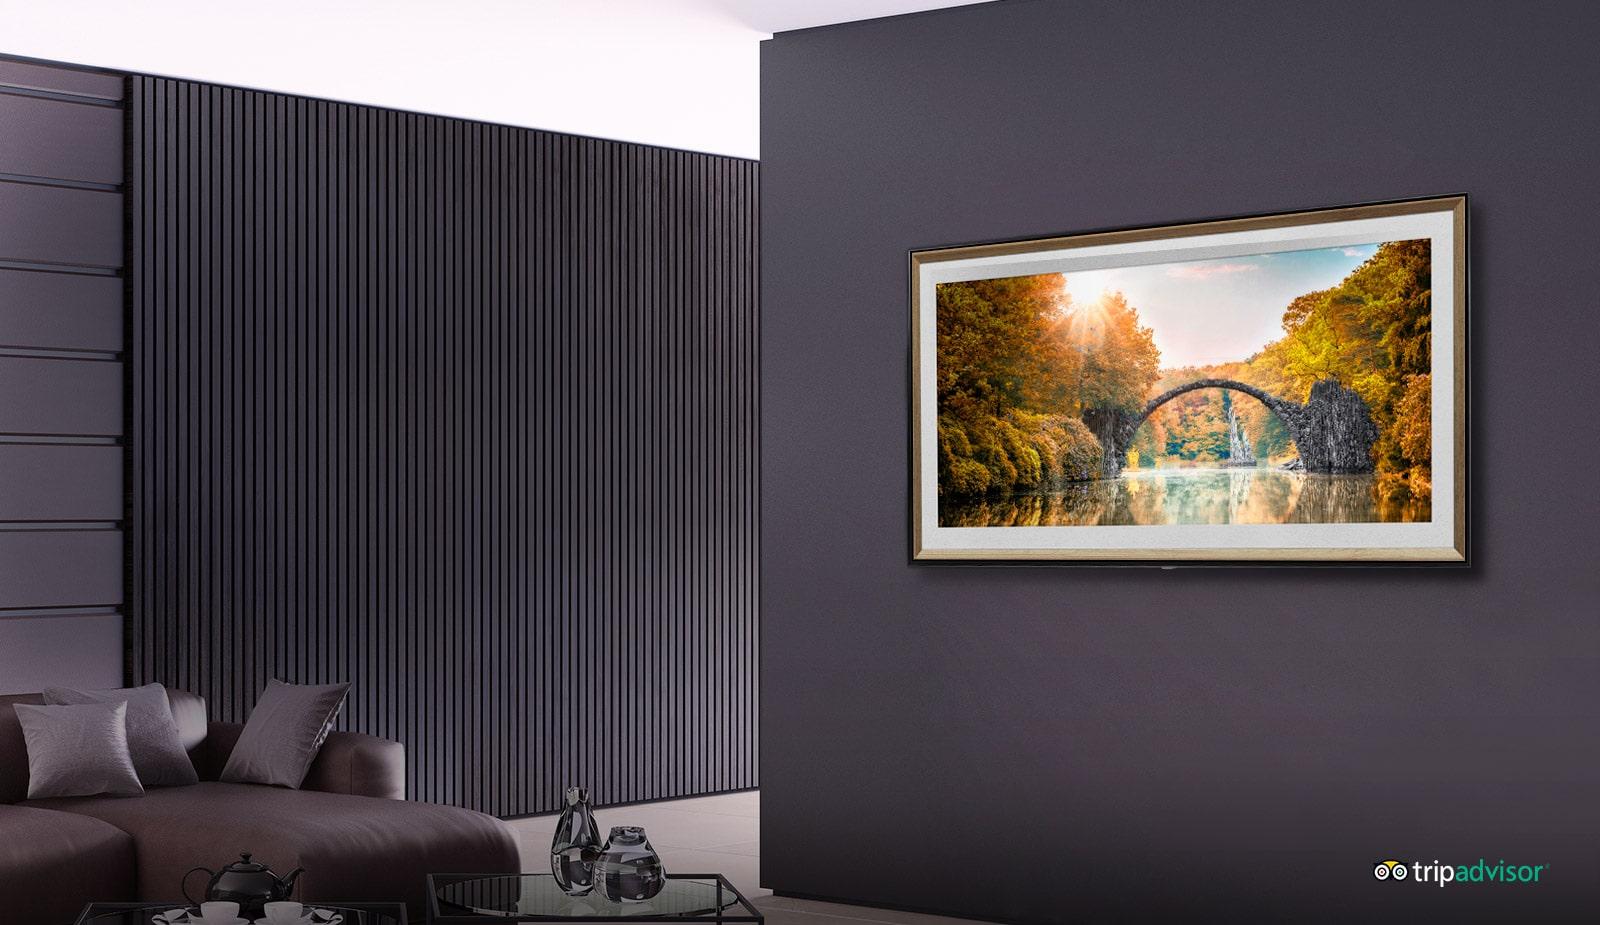 TV-NanoCell-SM94-12-Gallery-Mode-Desktop